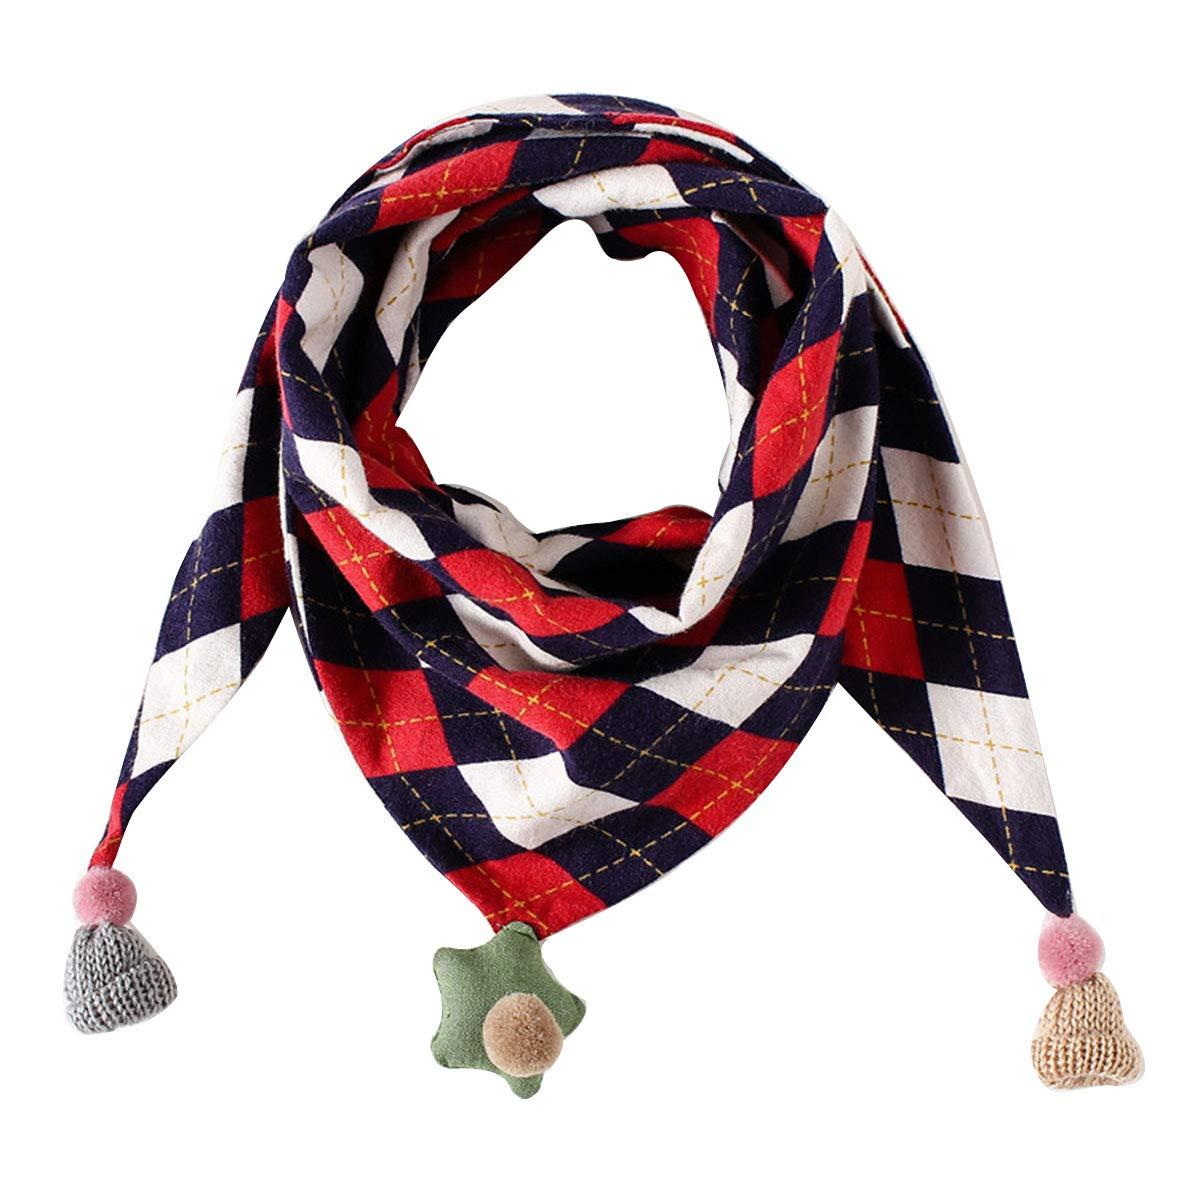 Monique Babies Kids Plaid Pattern Cotton Scarf Autumn Winter Warm Tassel Triangle Towel